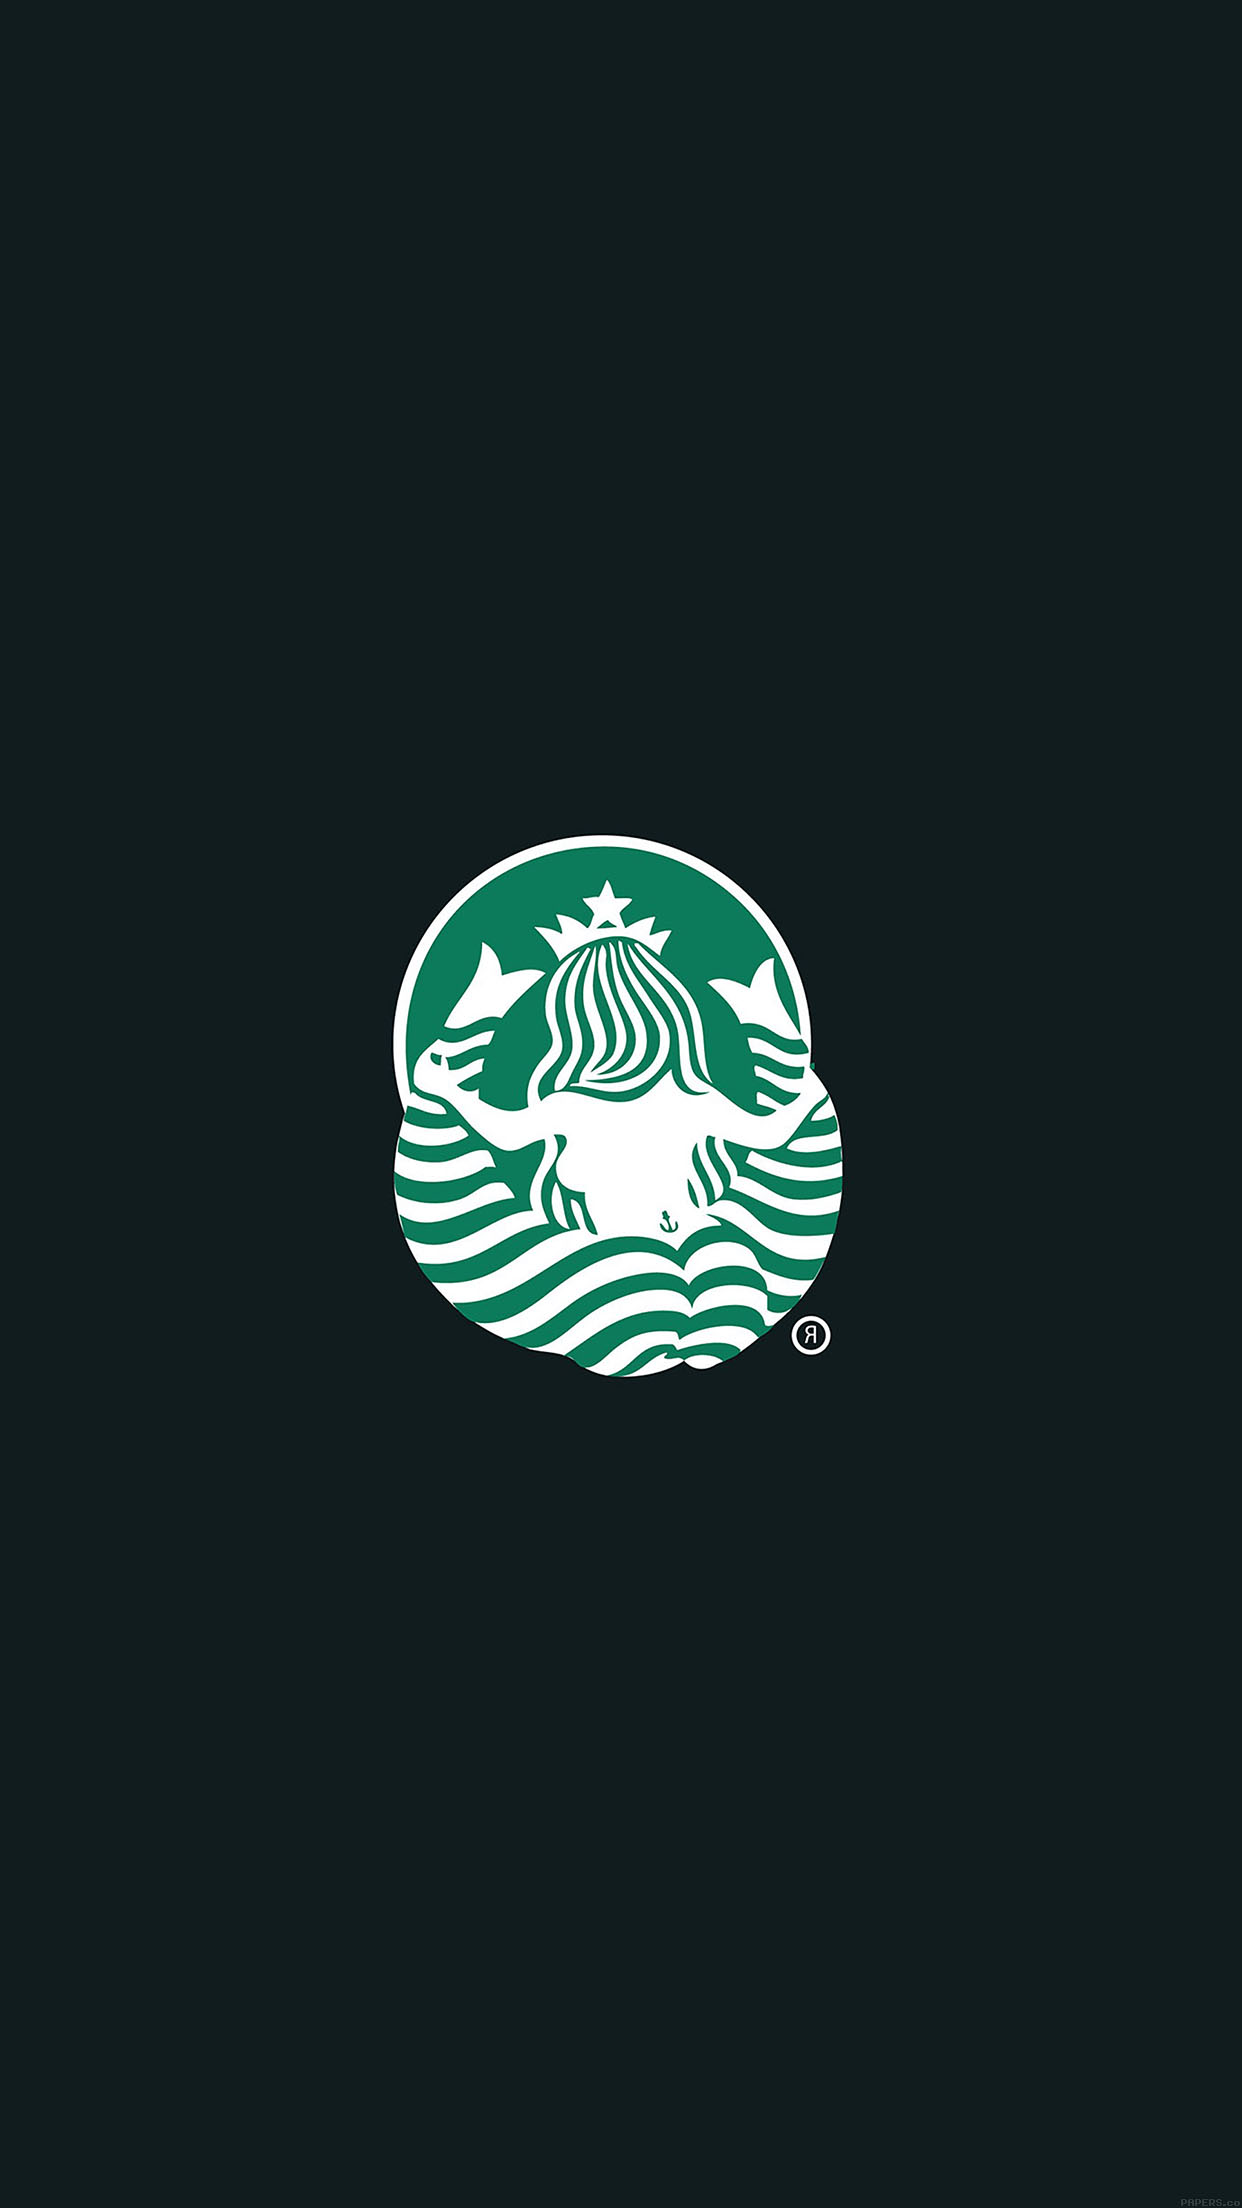 Iphonepapers Aa56 Back Of Starbucks Logo Art